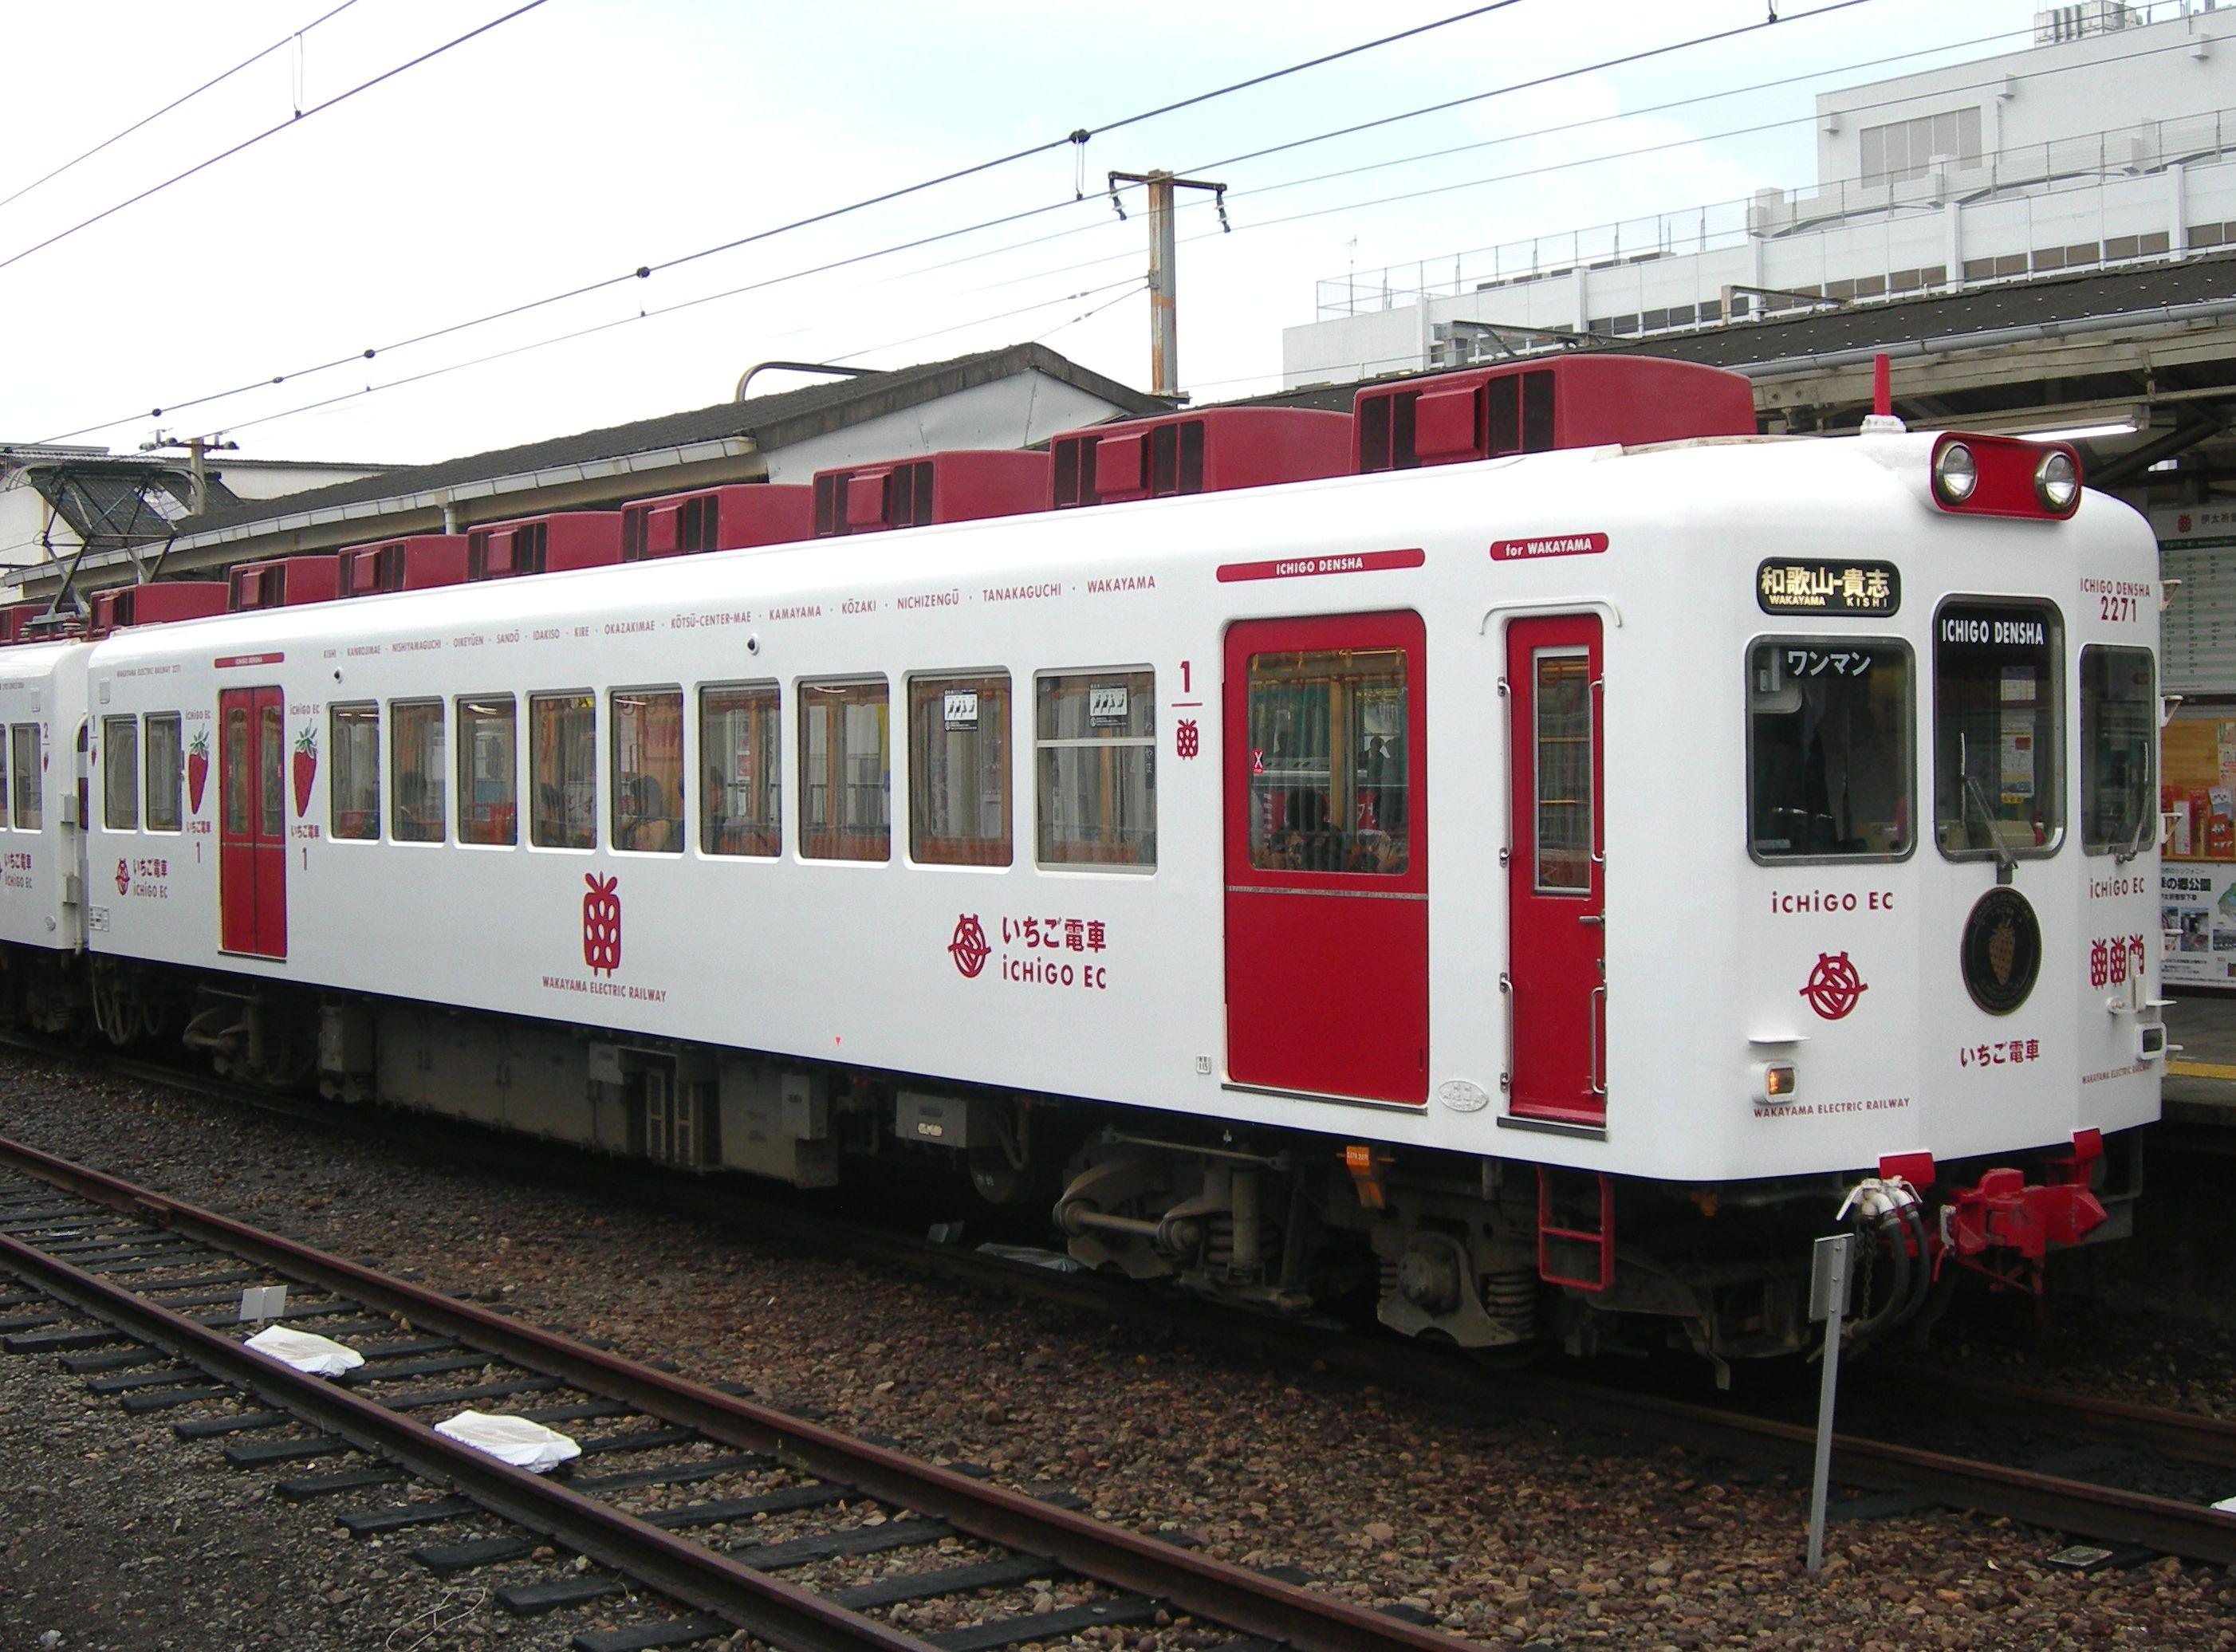 File:Wakayama Electric Railway 2271 Ichigo EC.jpg